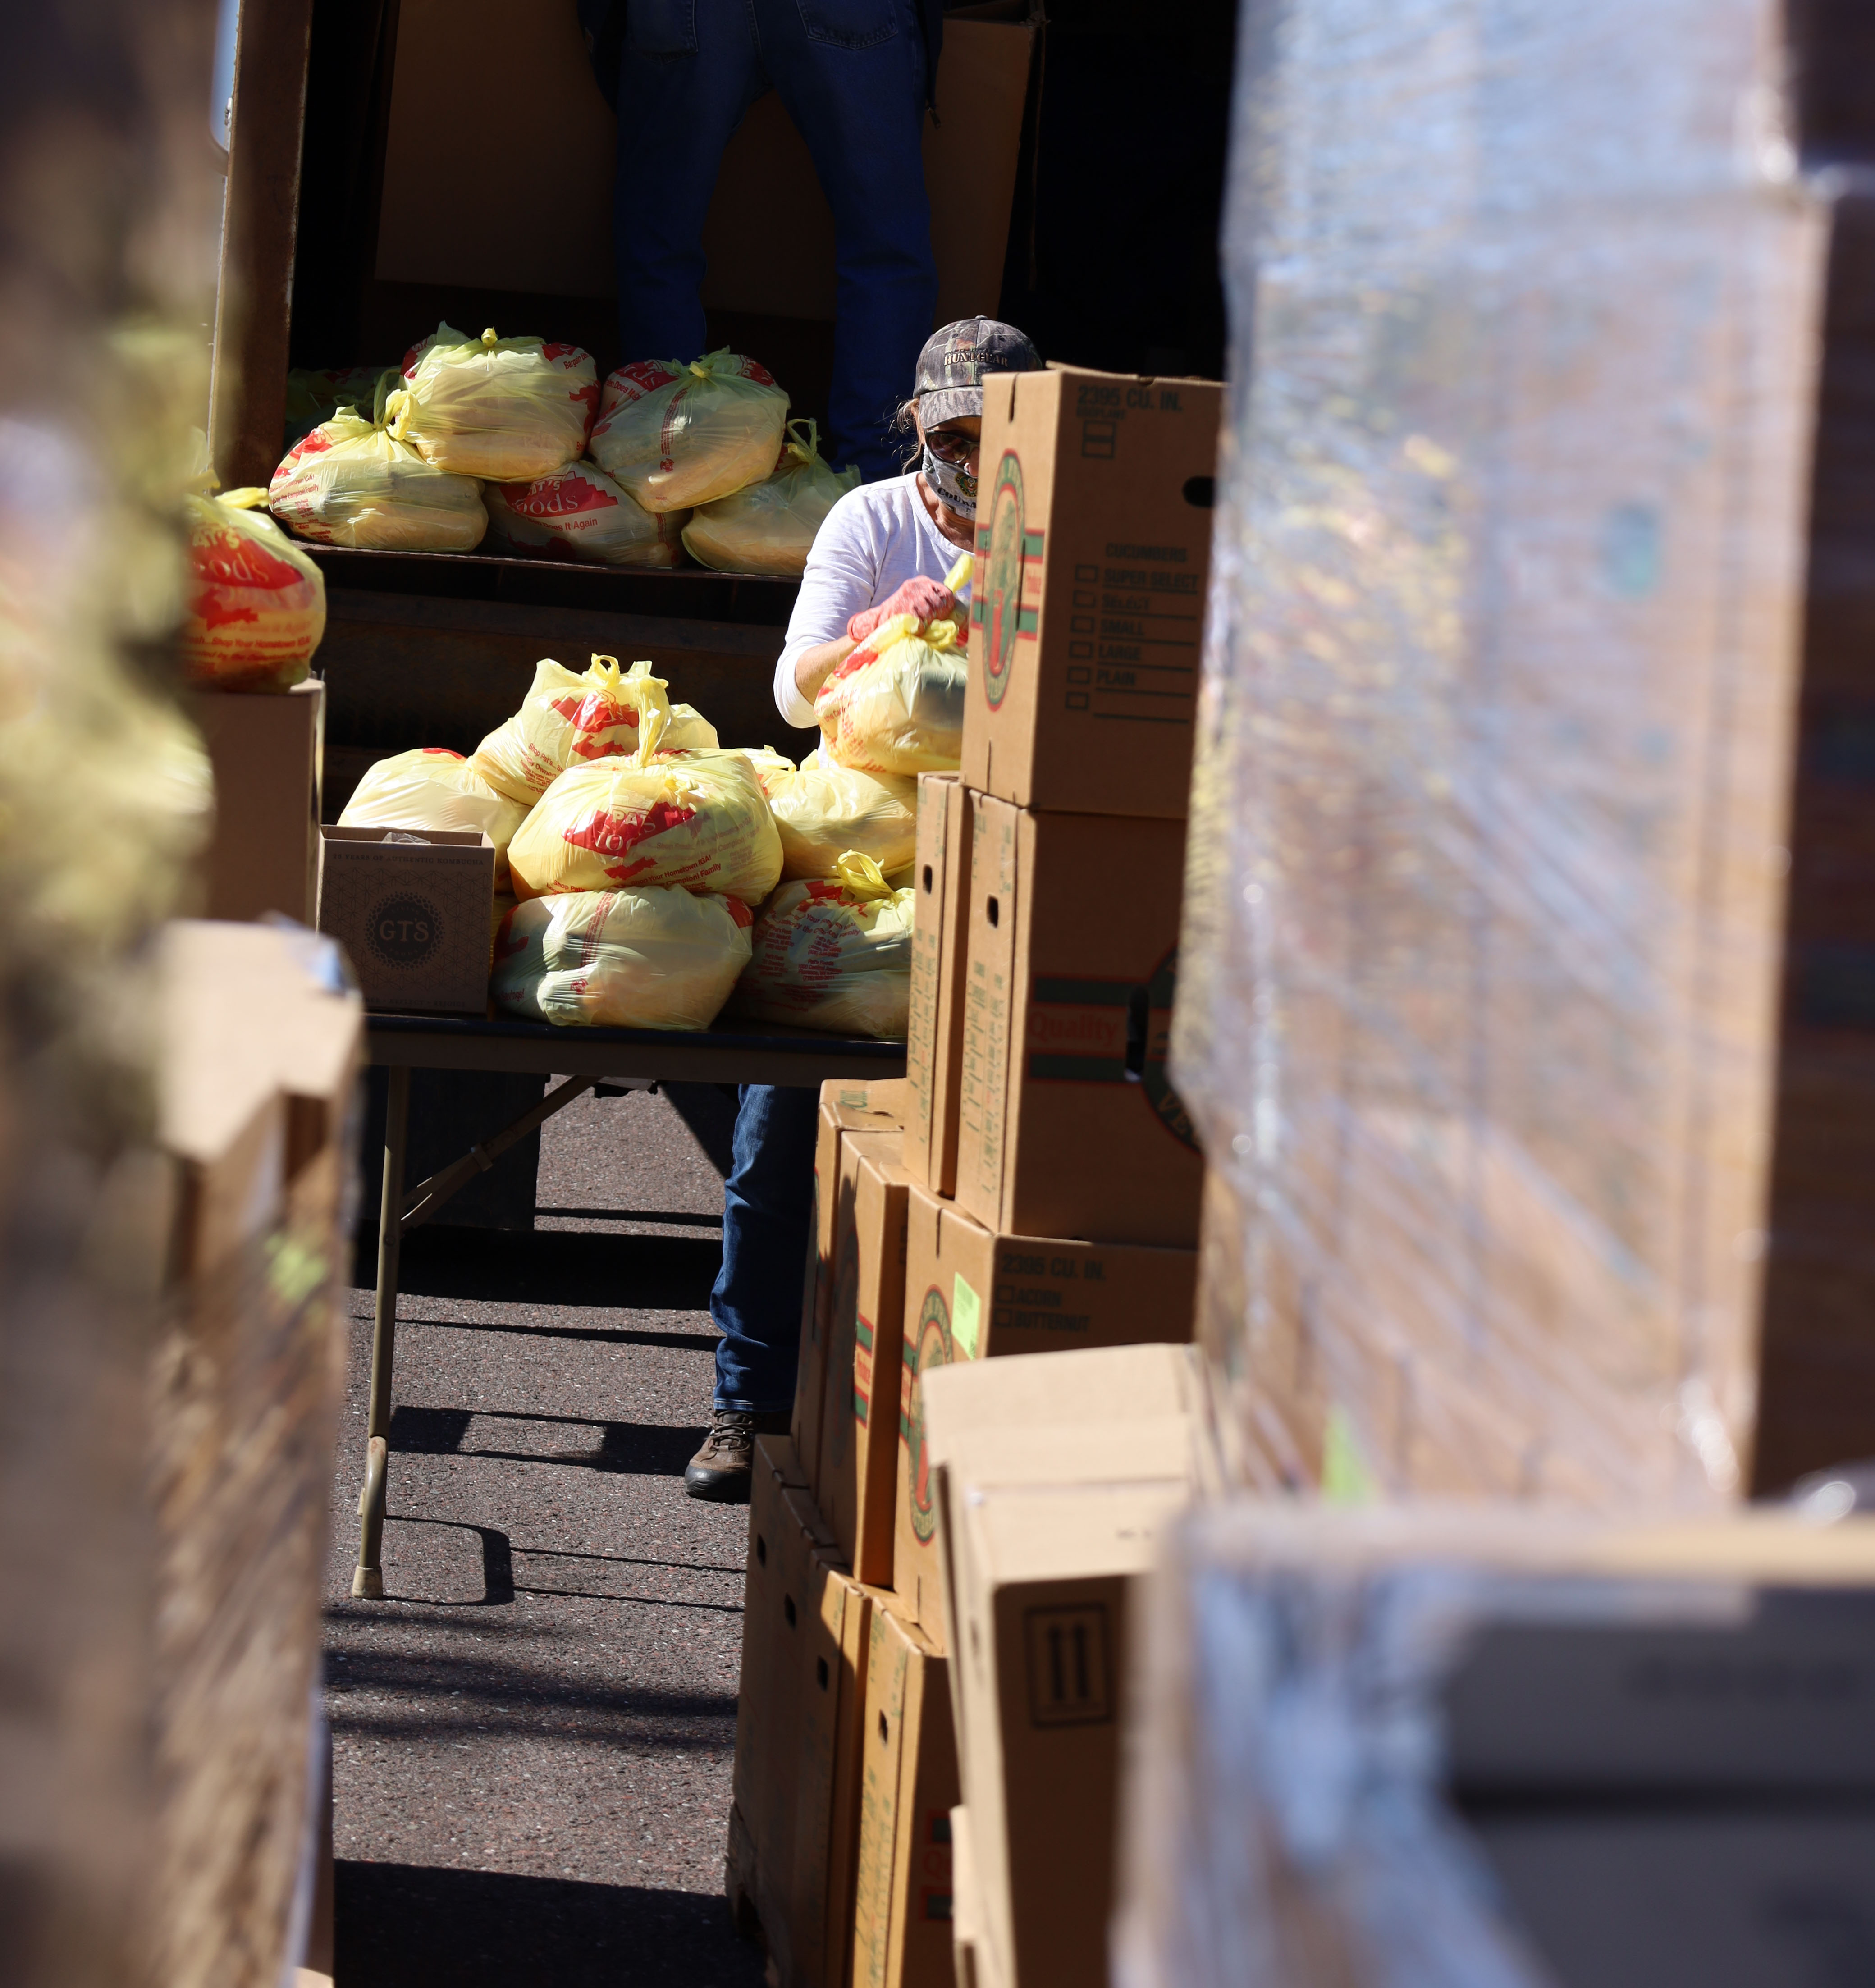 Mobile Food Pantry Boxes in LAnse